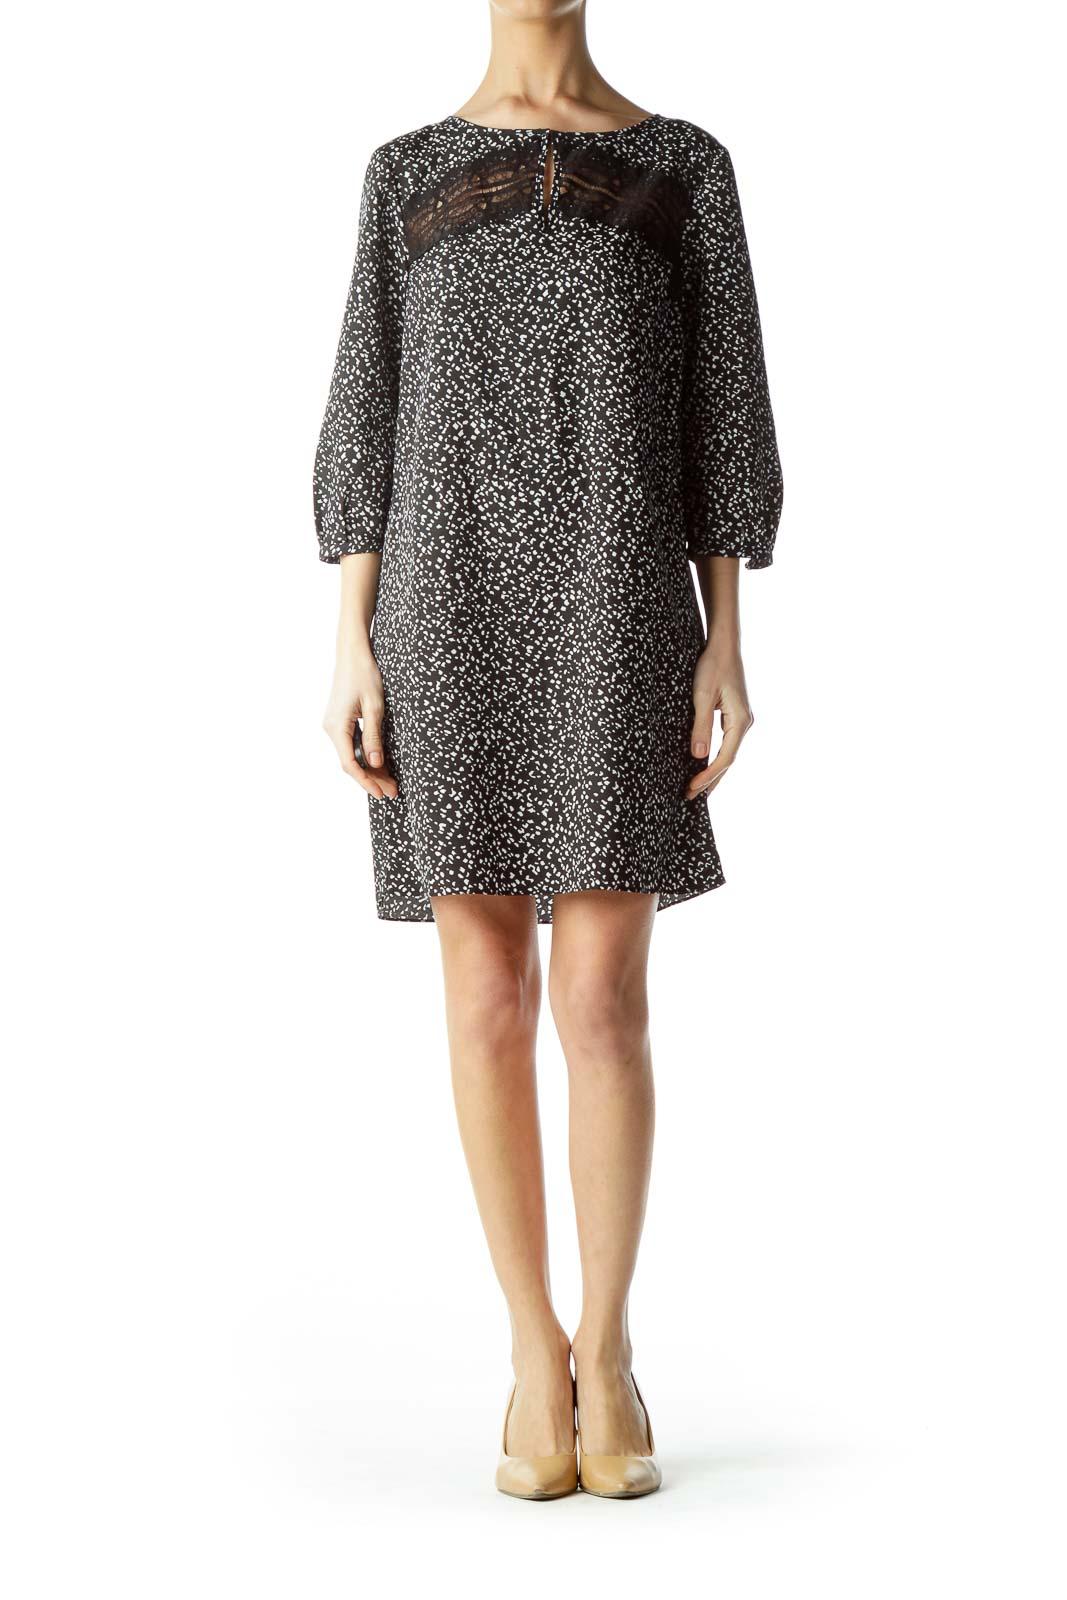 Black White Print Front Cut-Out Dress